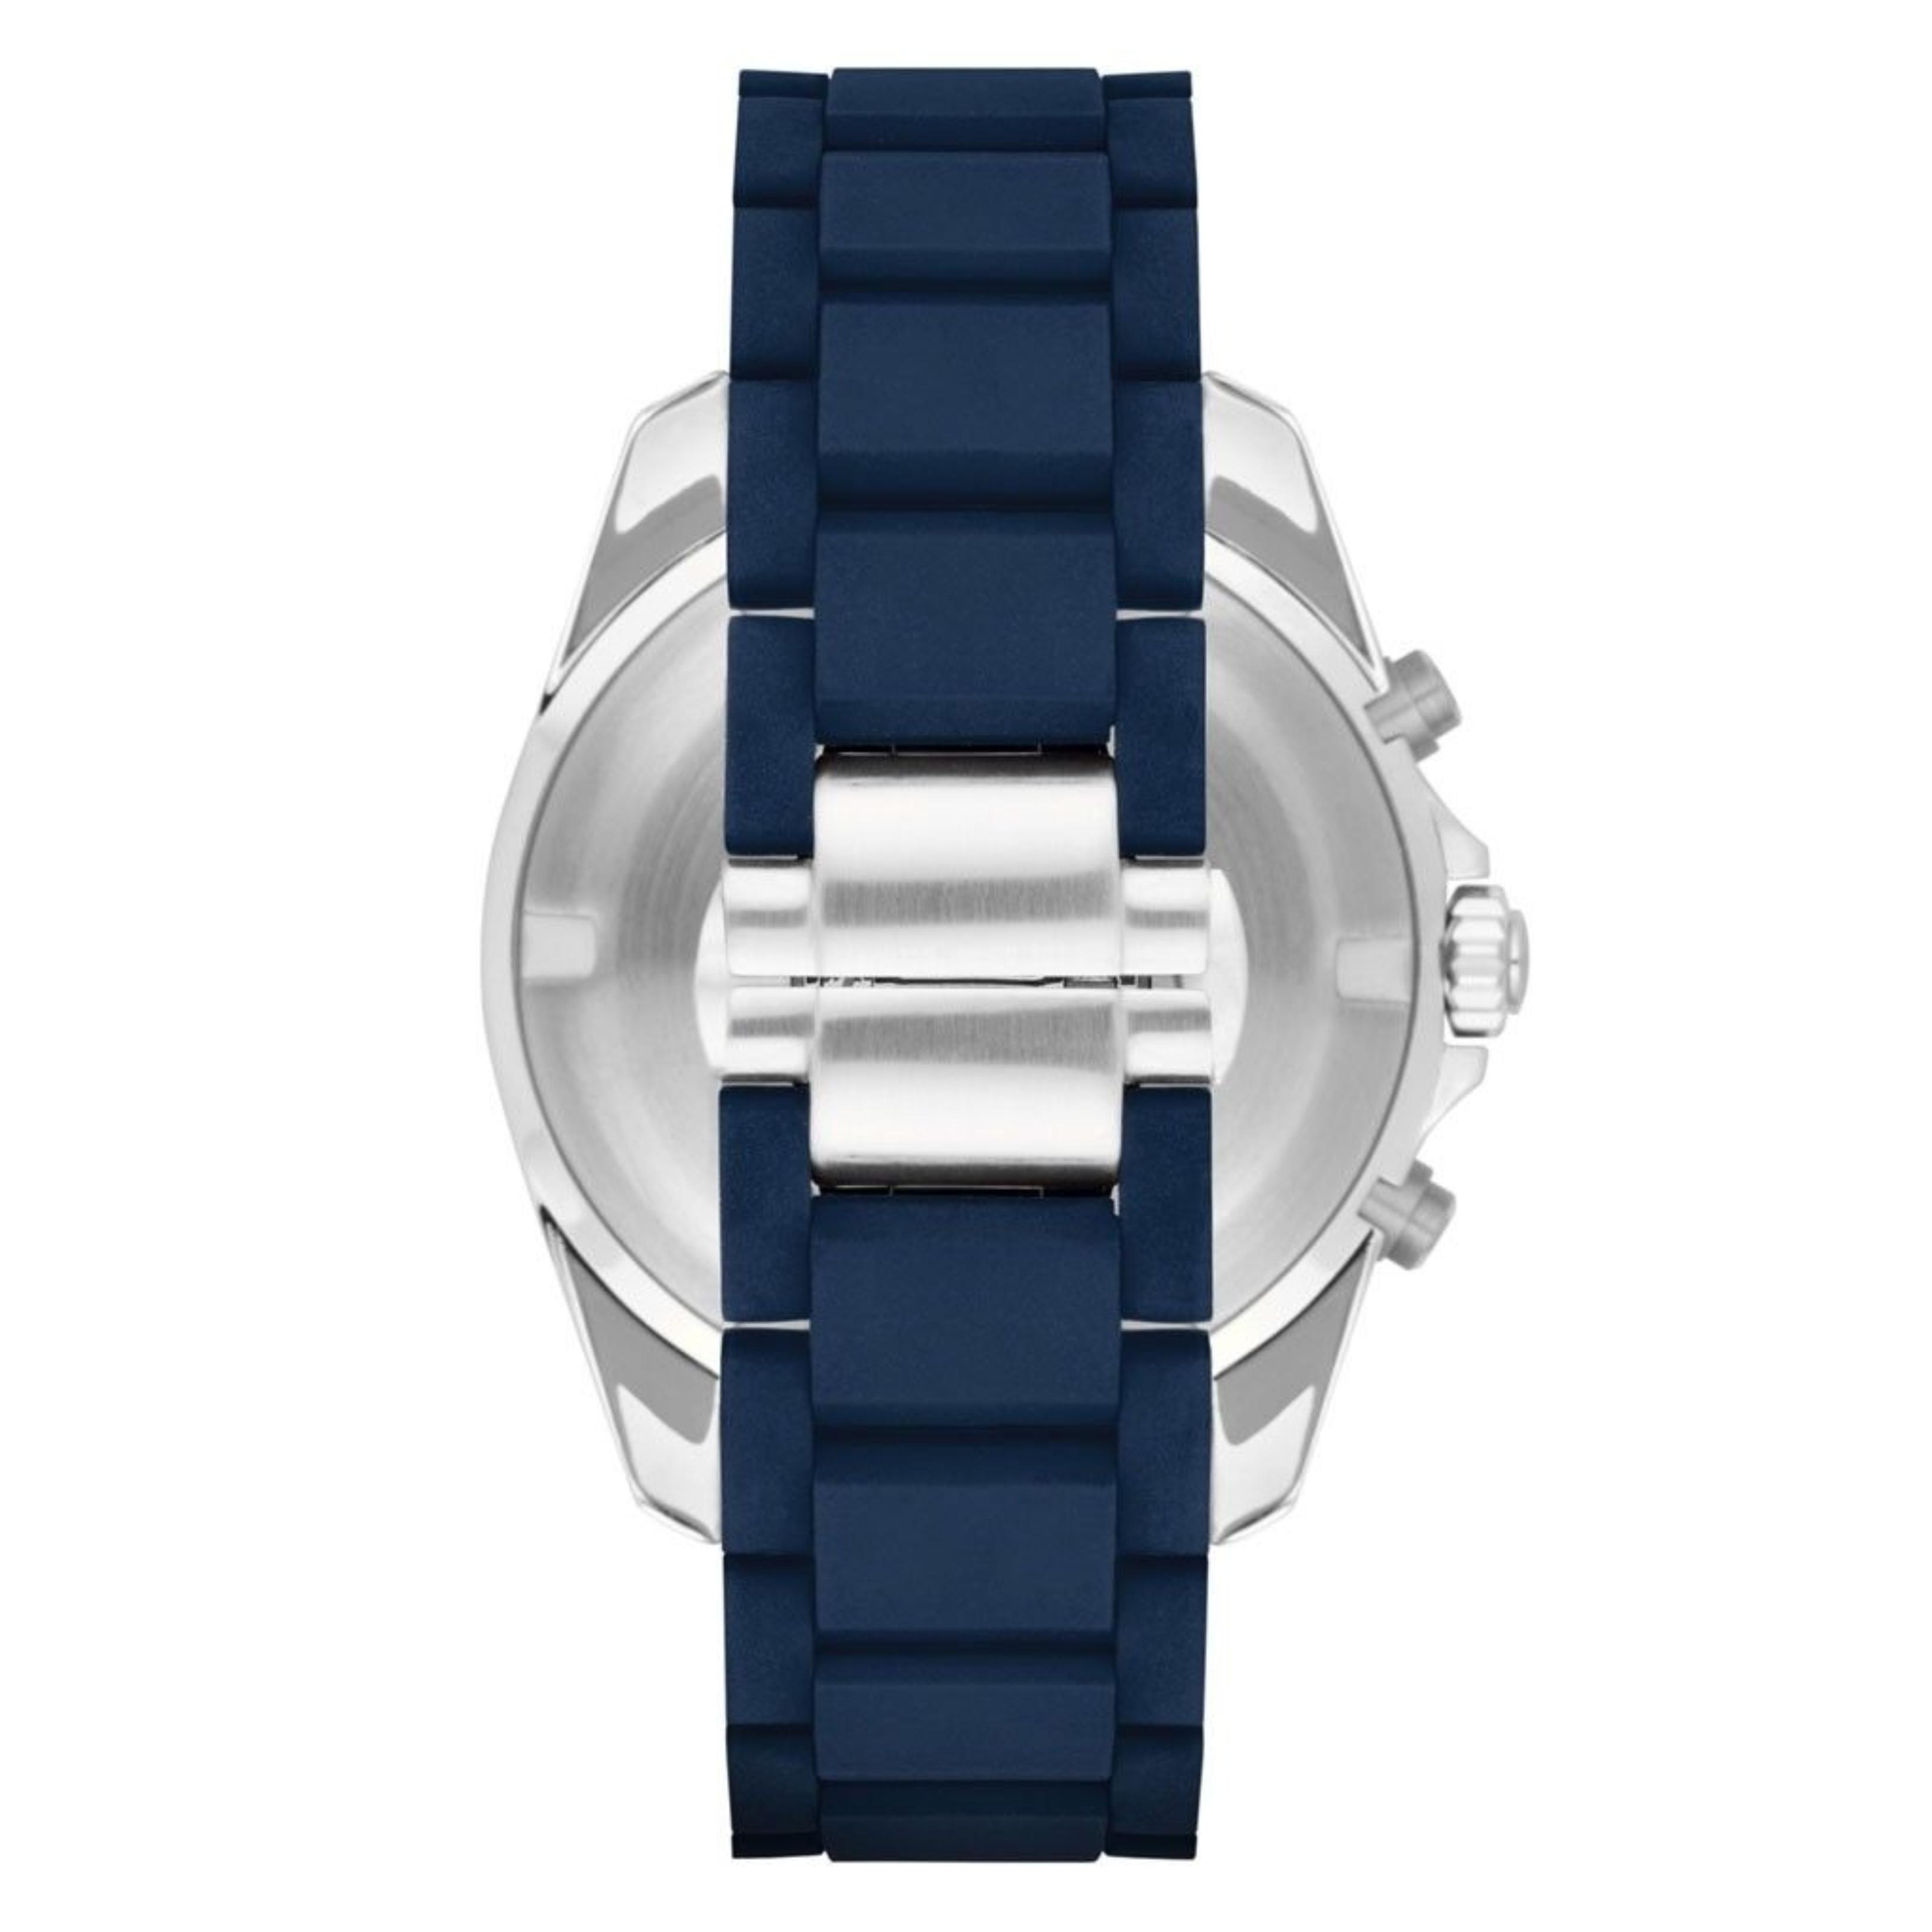 51bb06574b34 CENTINELA Reloj Emporio Armani Sportivo para hombre AR6068│ Cronógrafo con  esfera azul ub Correa de caucho